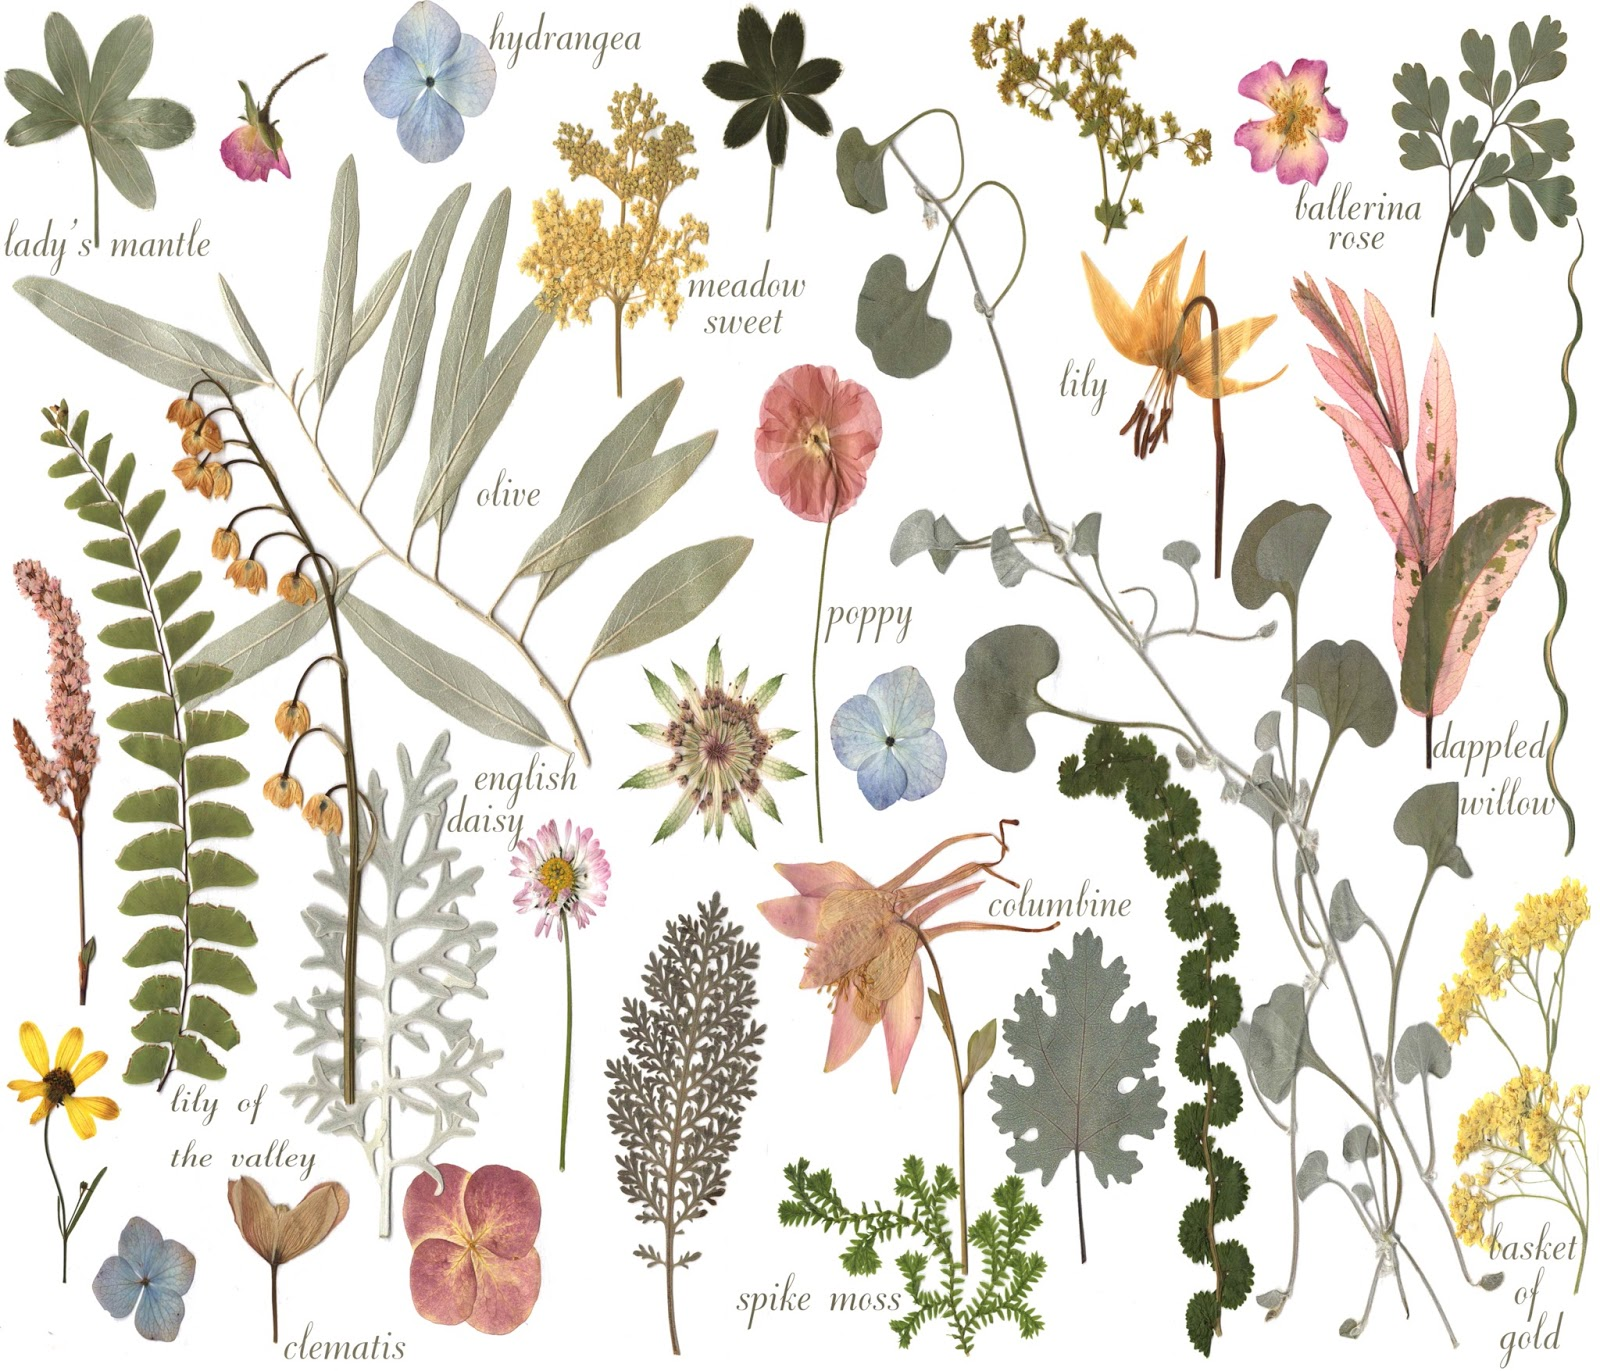 My Petal Press Garden Blog: Botanical Sketchbook art on fabric